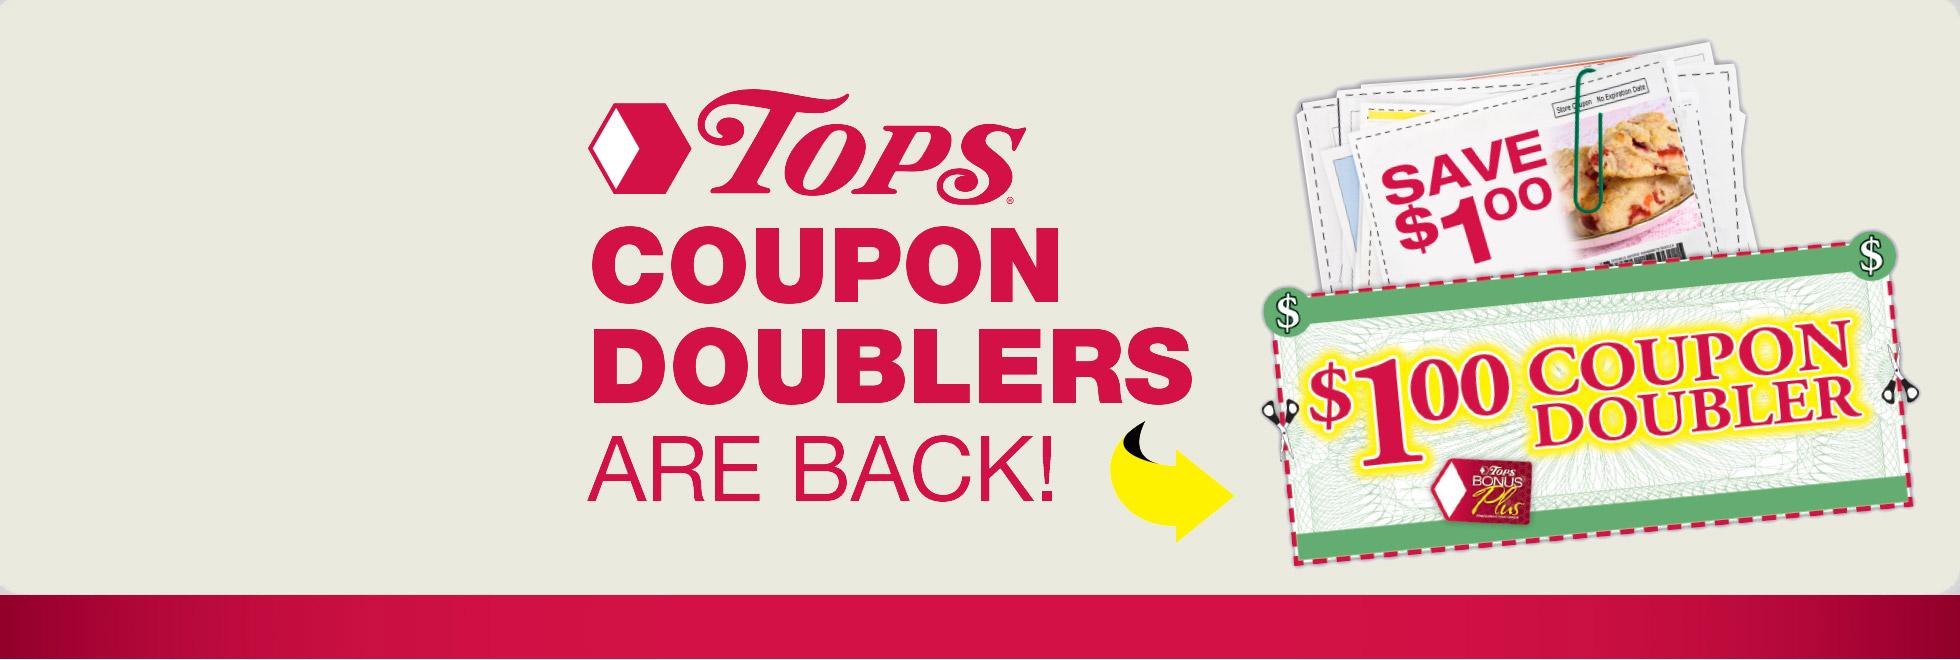 Tops super coupons